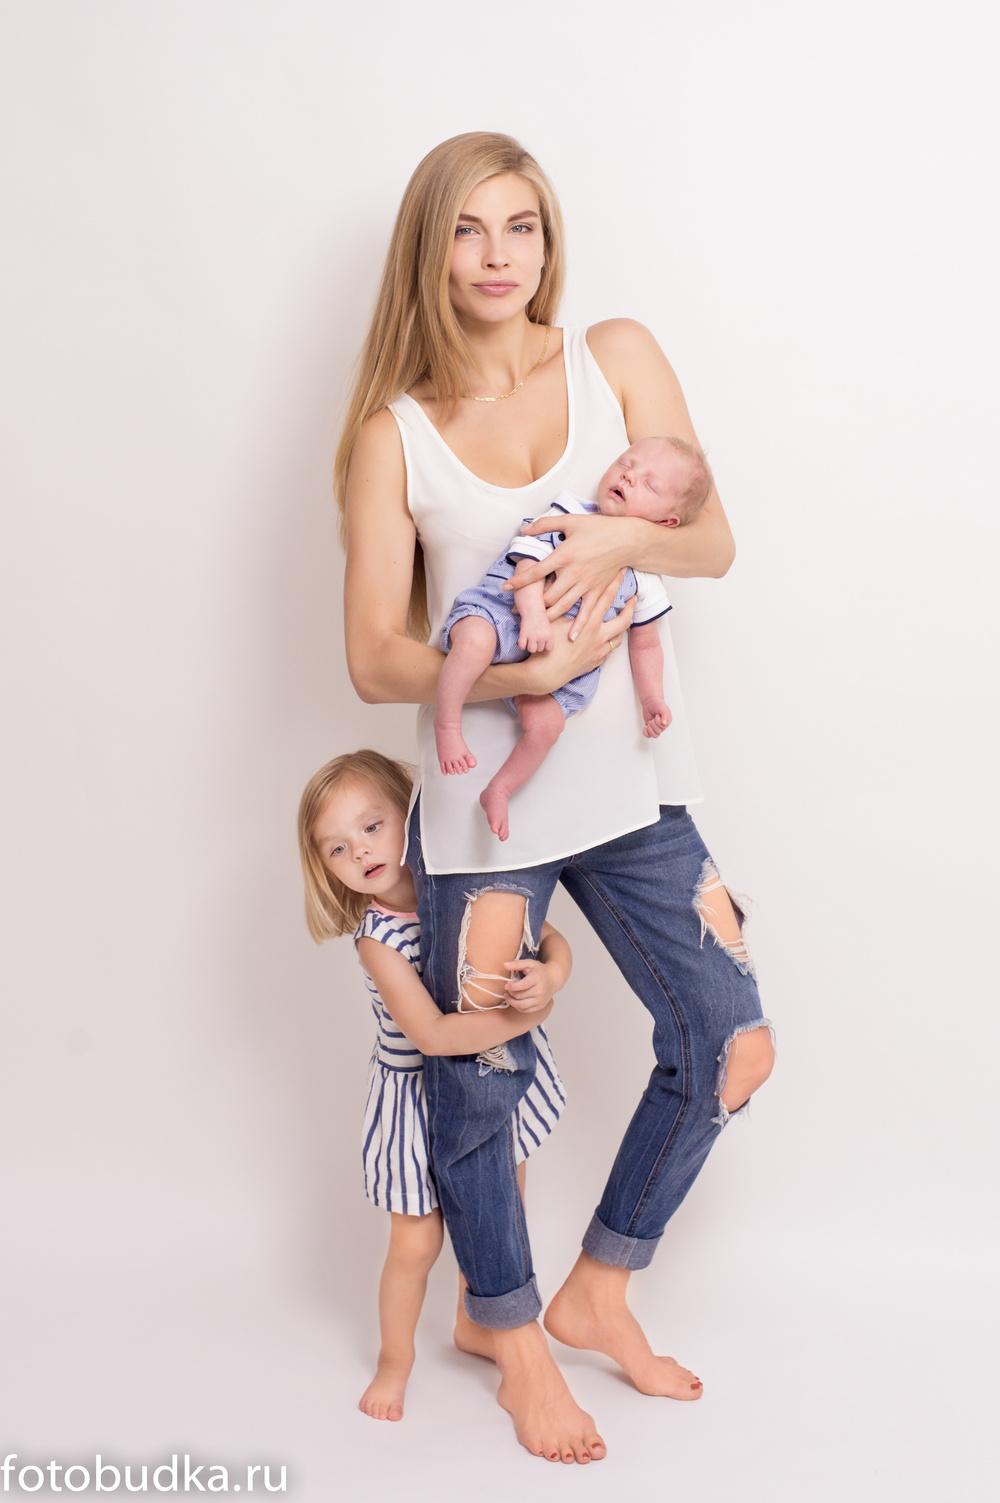 Семья, светлый фон